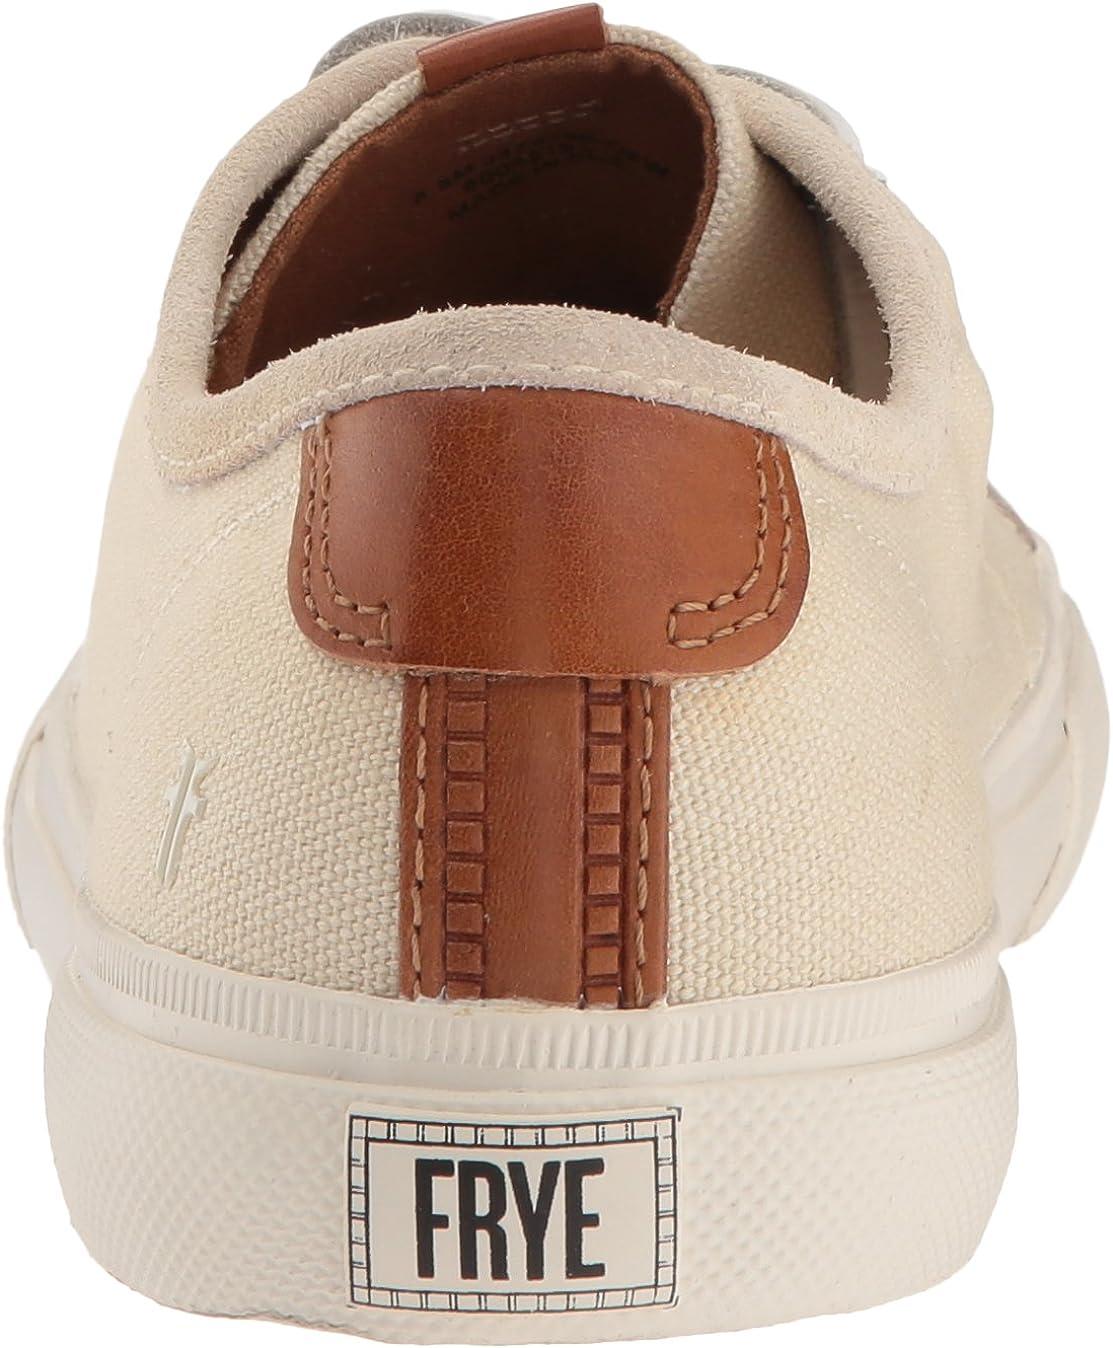 Frye Womens Gia Canvas Low Lace Sneaker